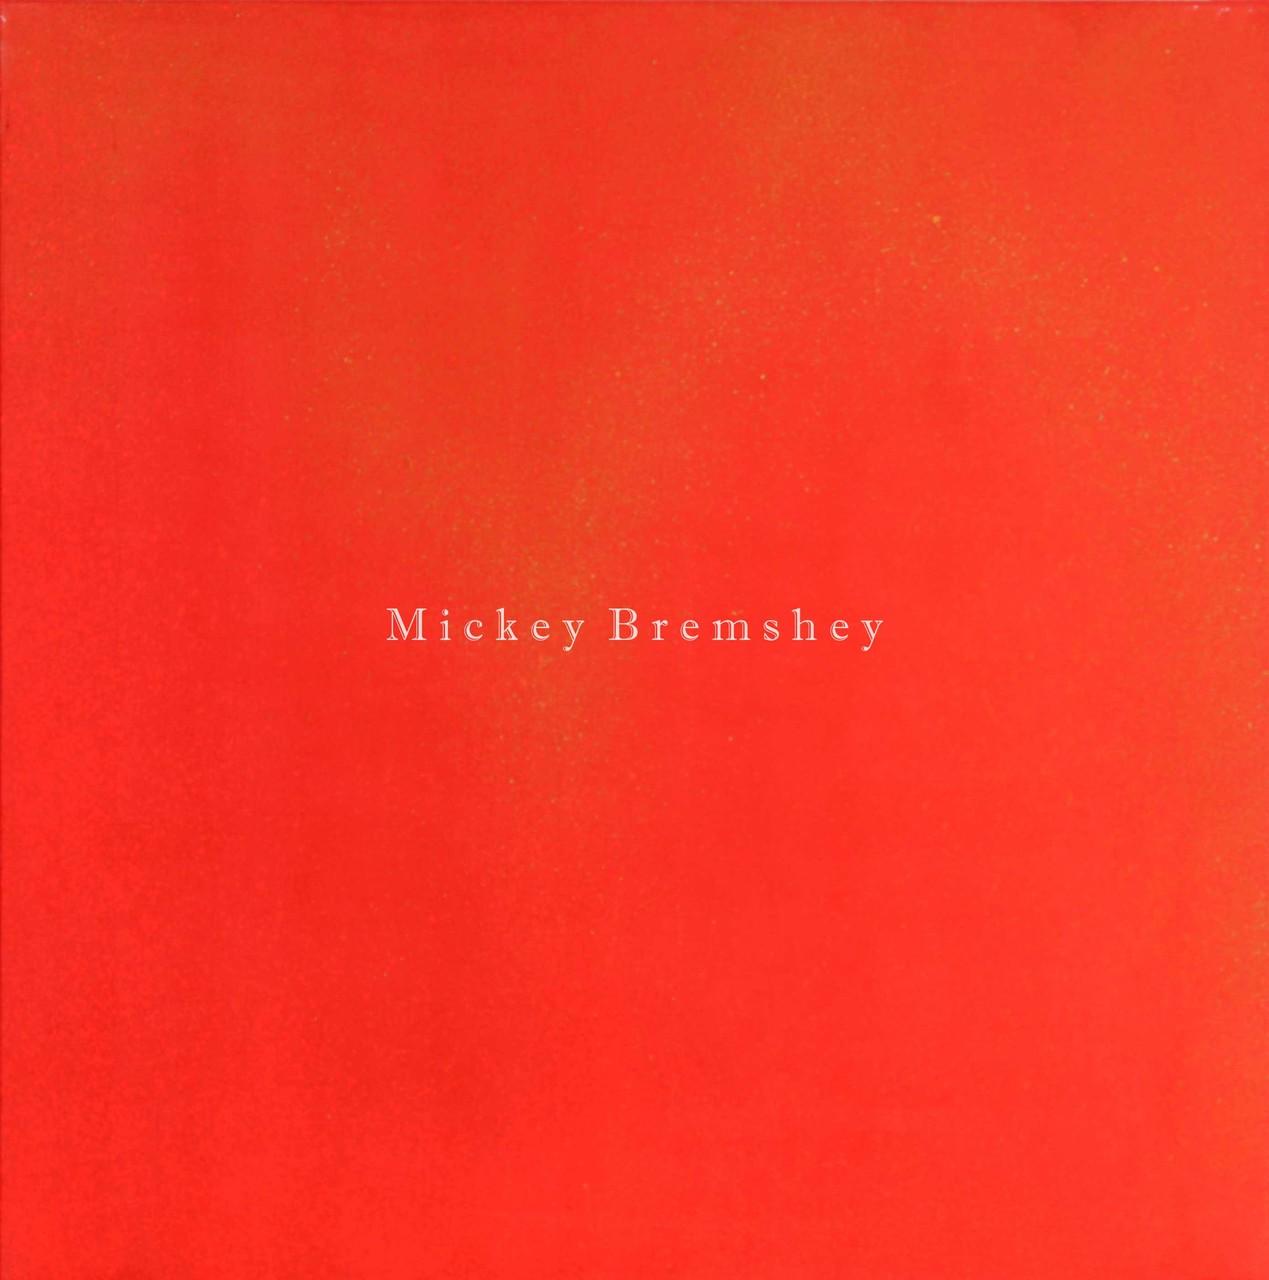 bremshey.illuminare.081275-004-t